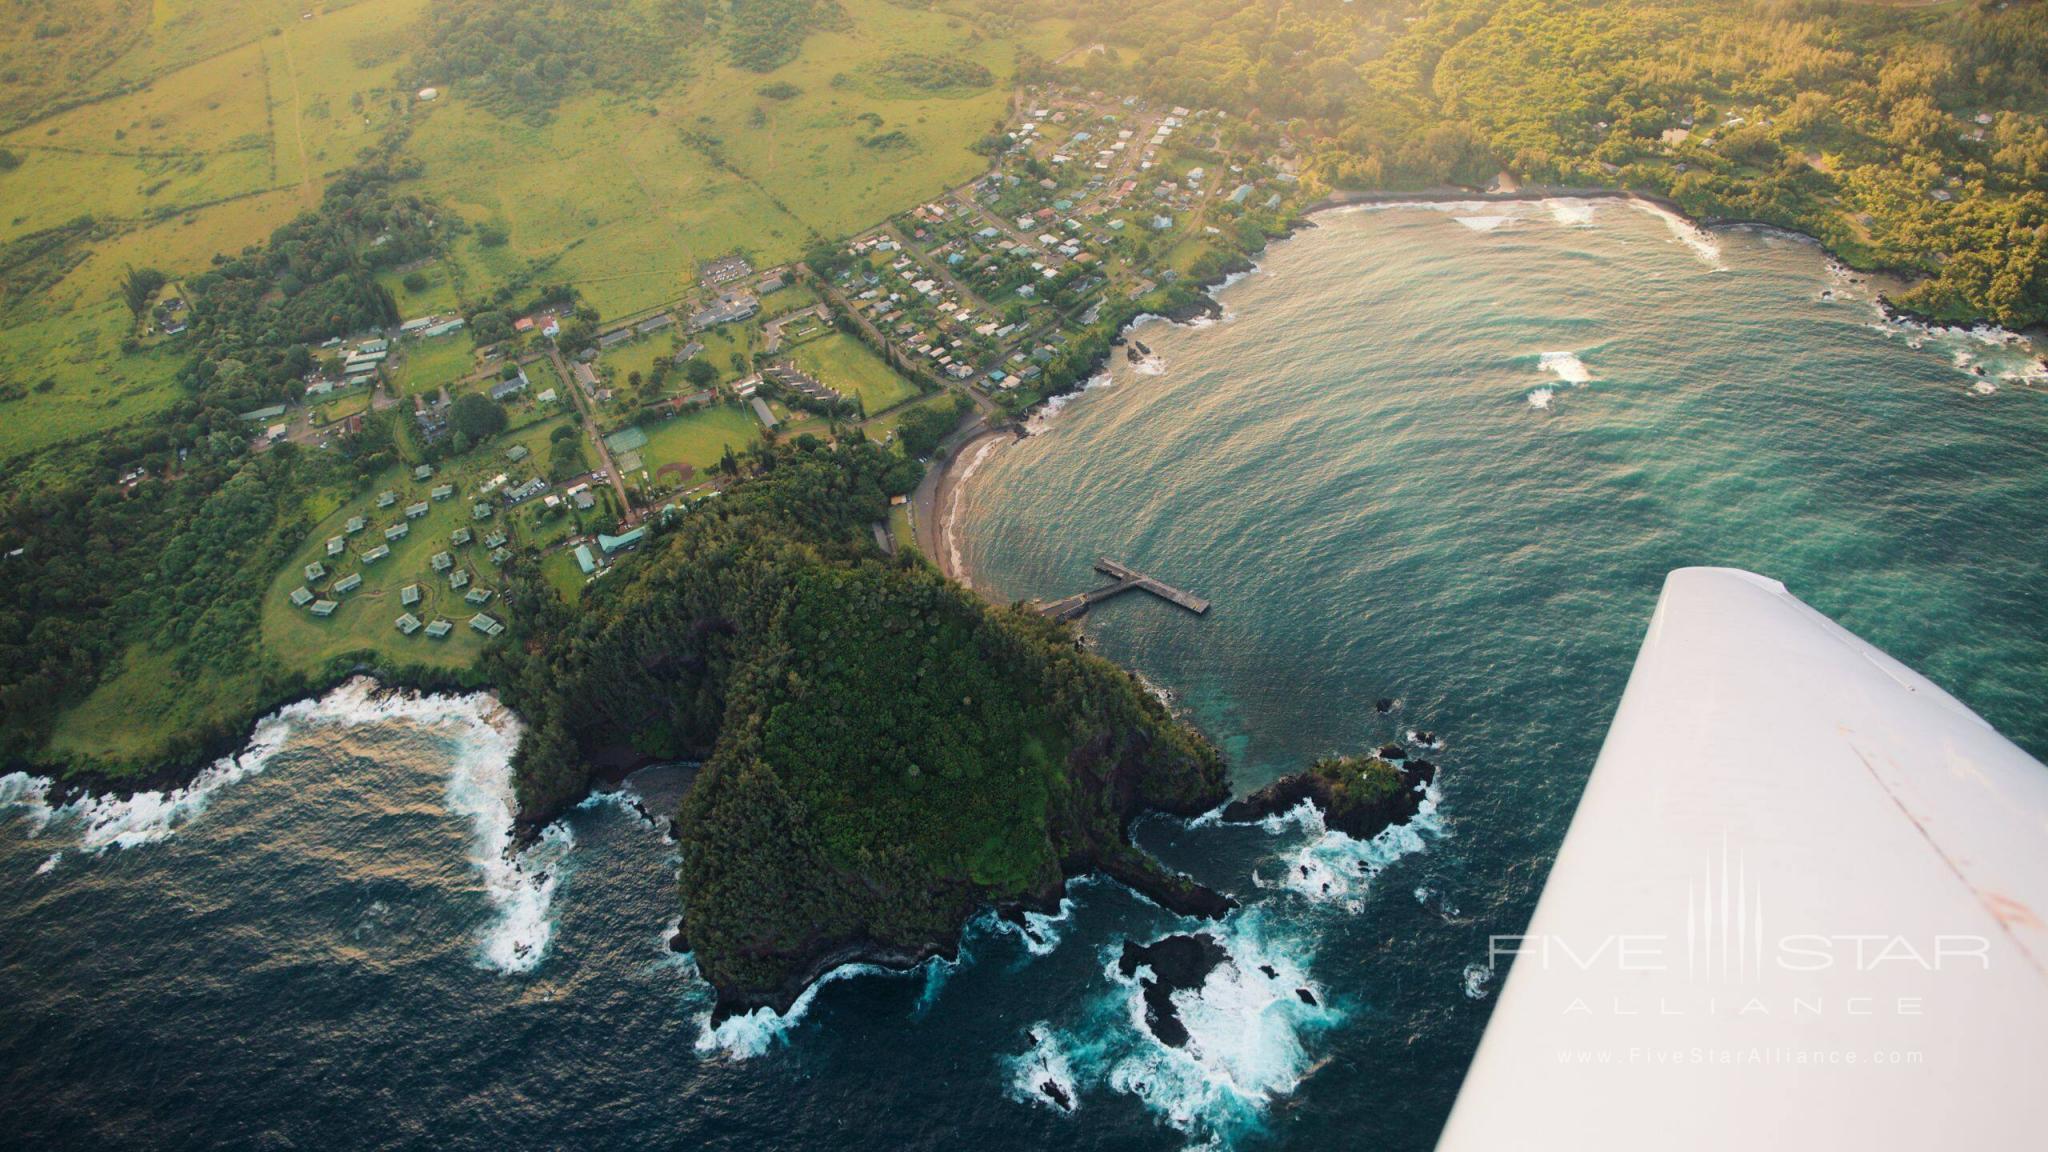 Hana-Maui Plane Aerial